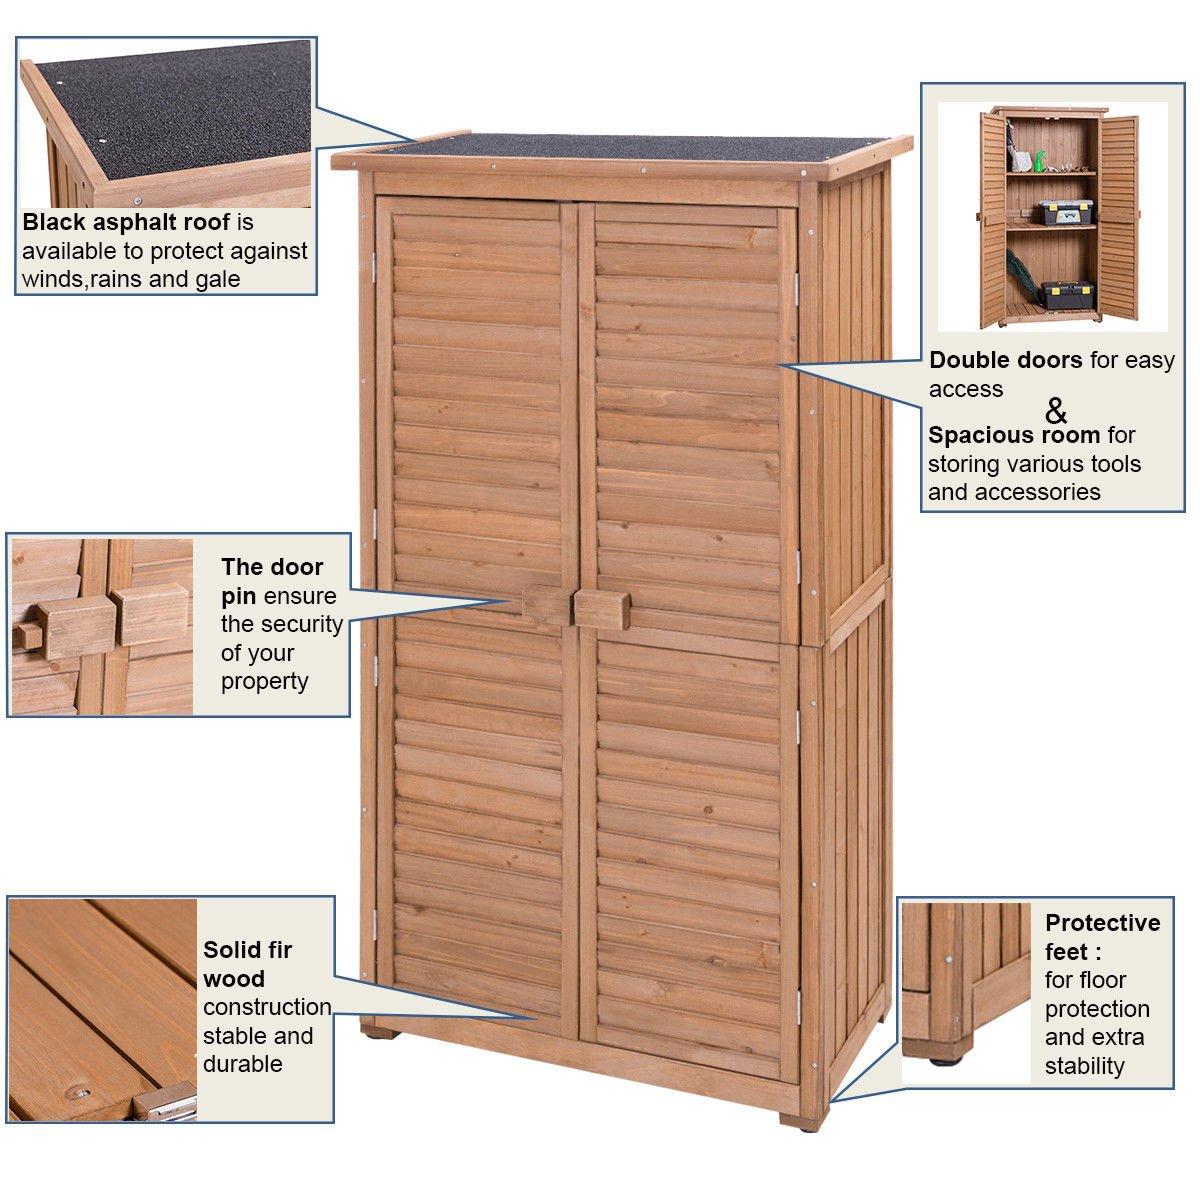 Goplus Garden Storage Shed Fir Wood Shutter Design Wooden Lockers for Outdoor Superbuy